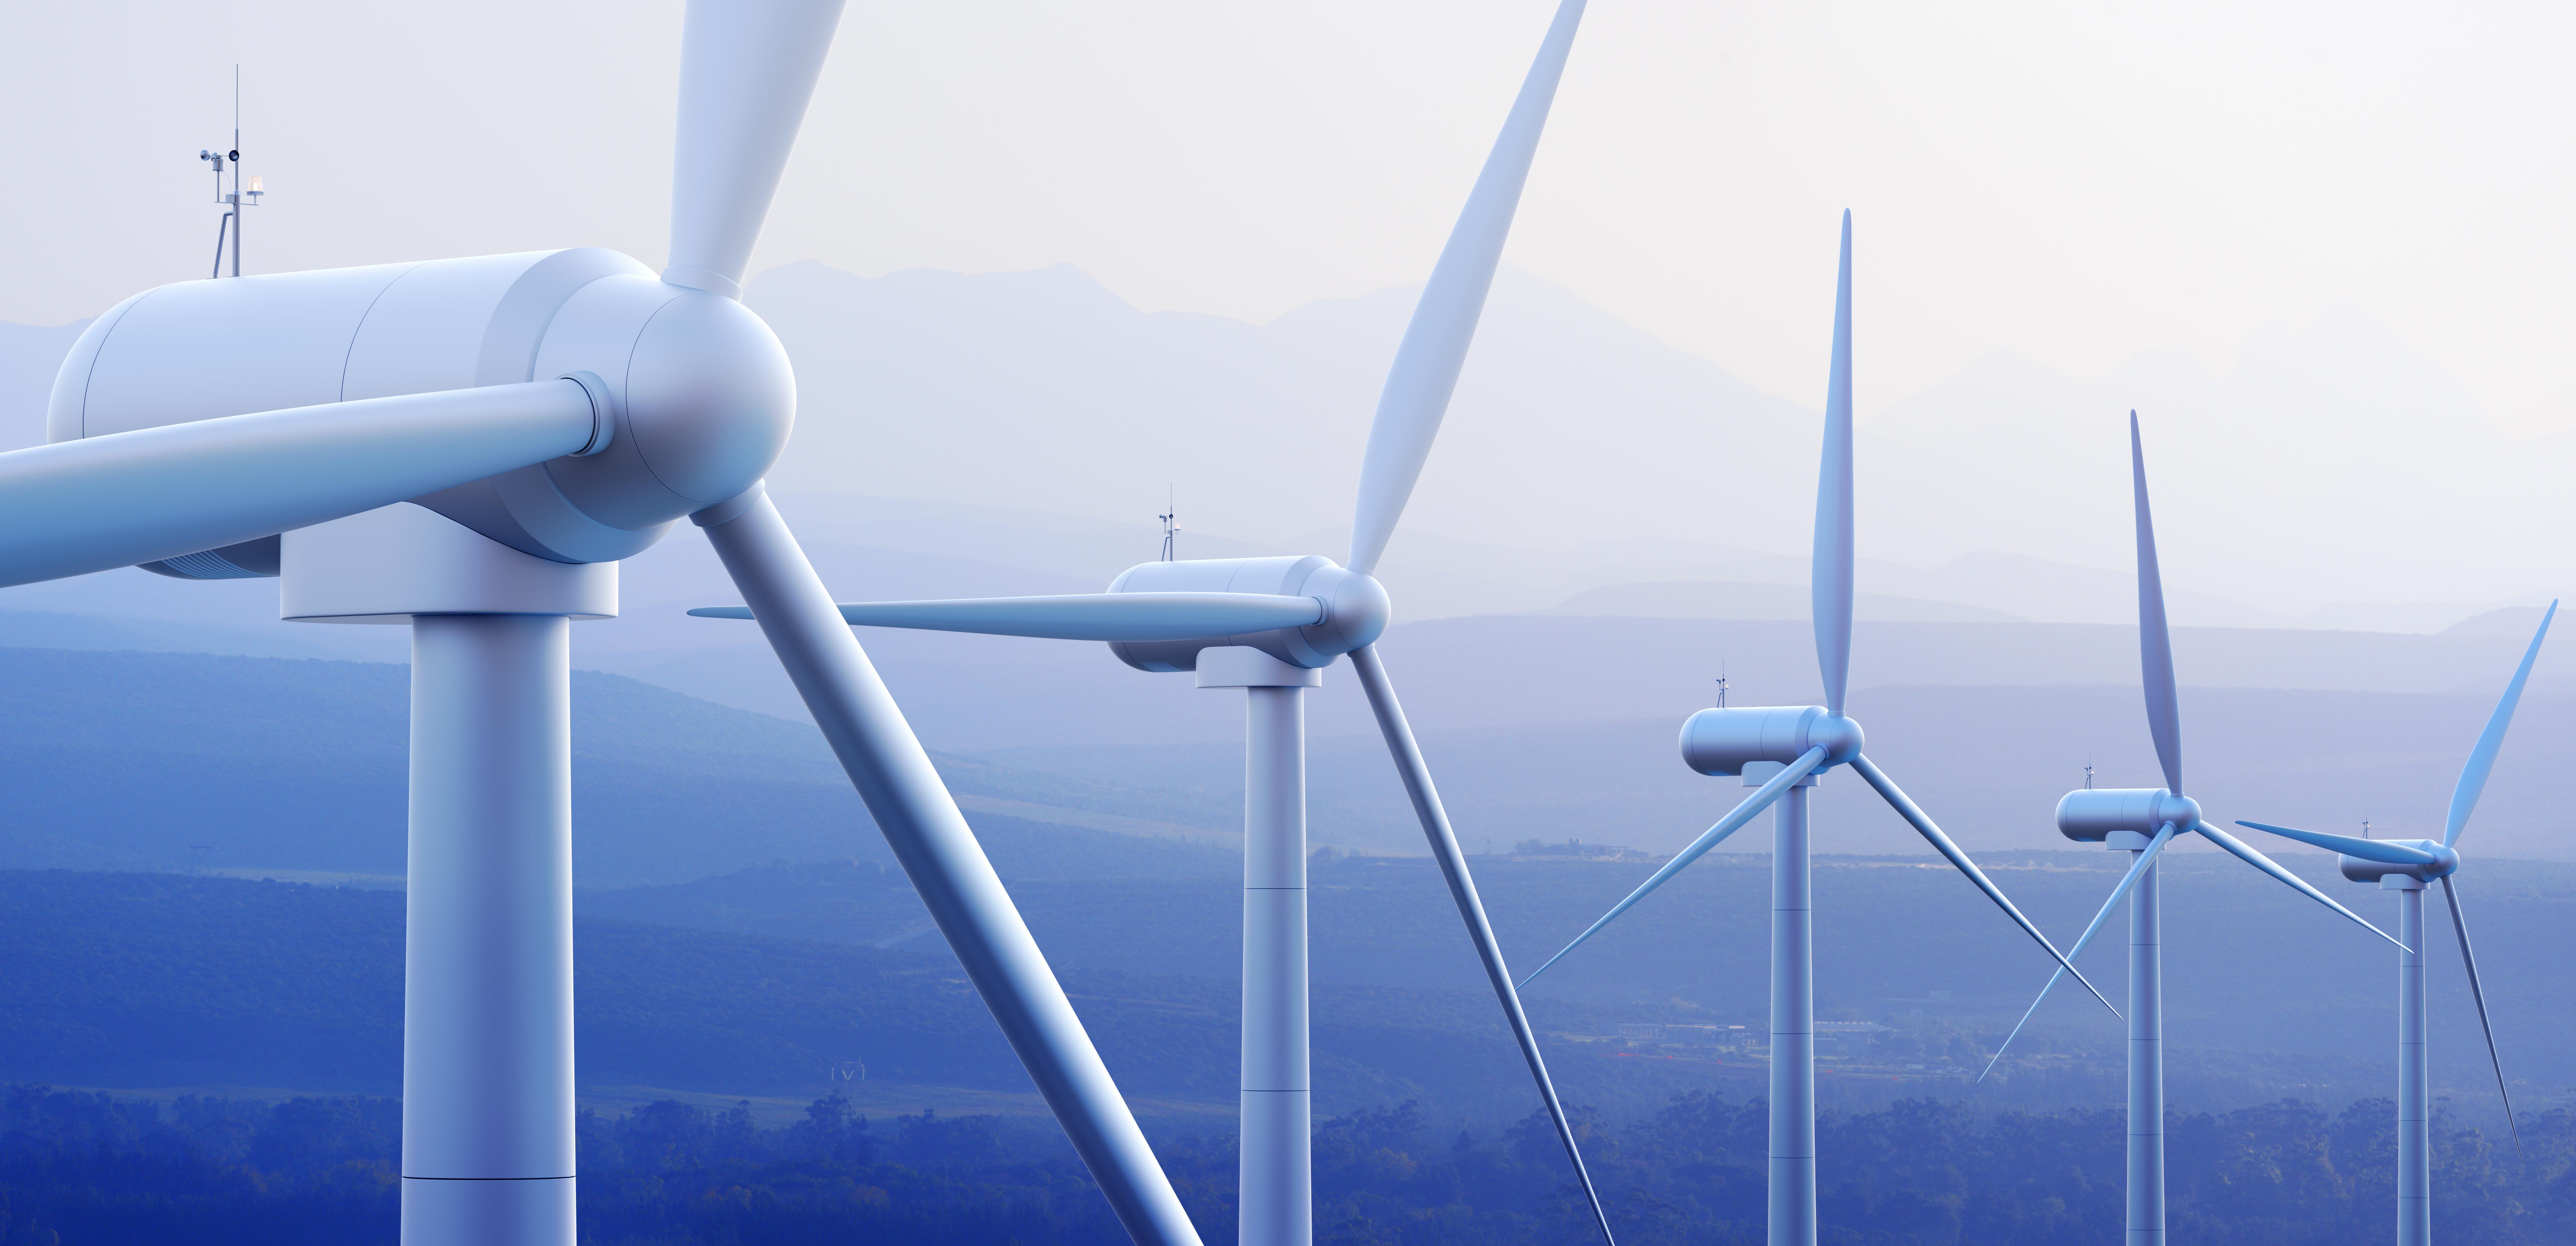 DECO Minho esclarece alunos da ESTG-IPVC sobre o mercado de energia